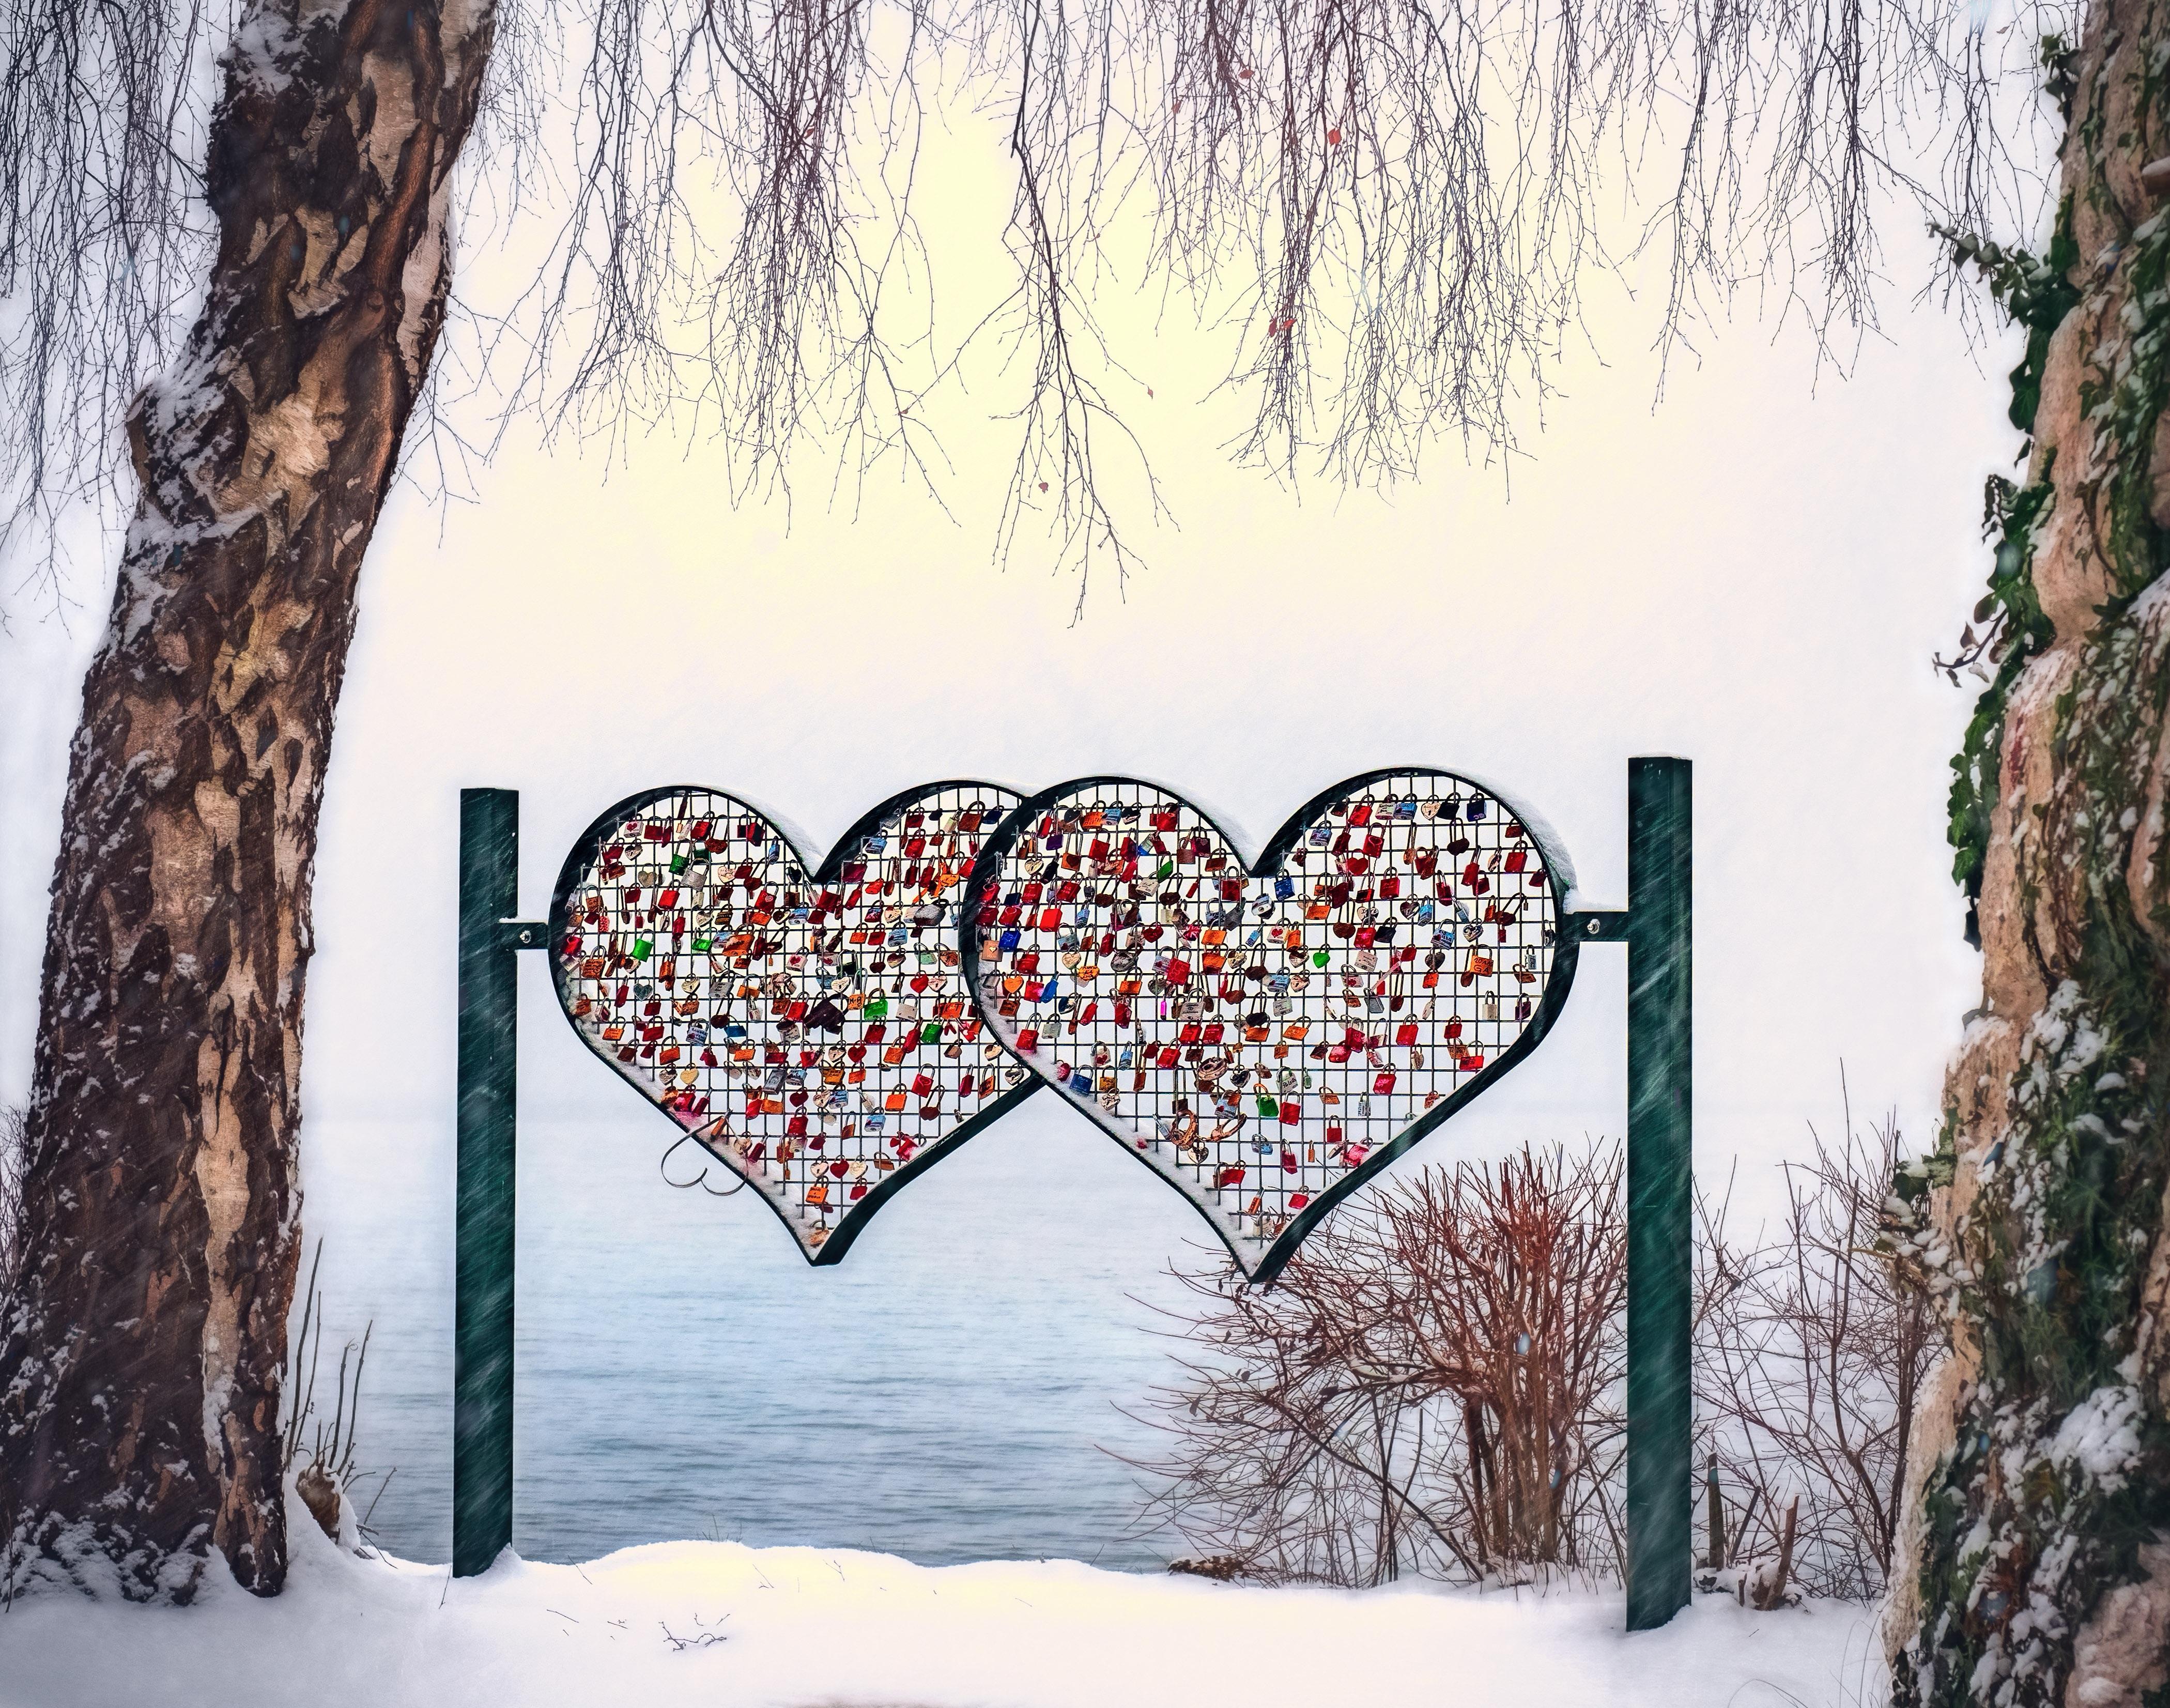 Free Images Valentine Valentines Day Romance Romantic Luck